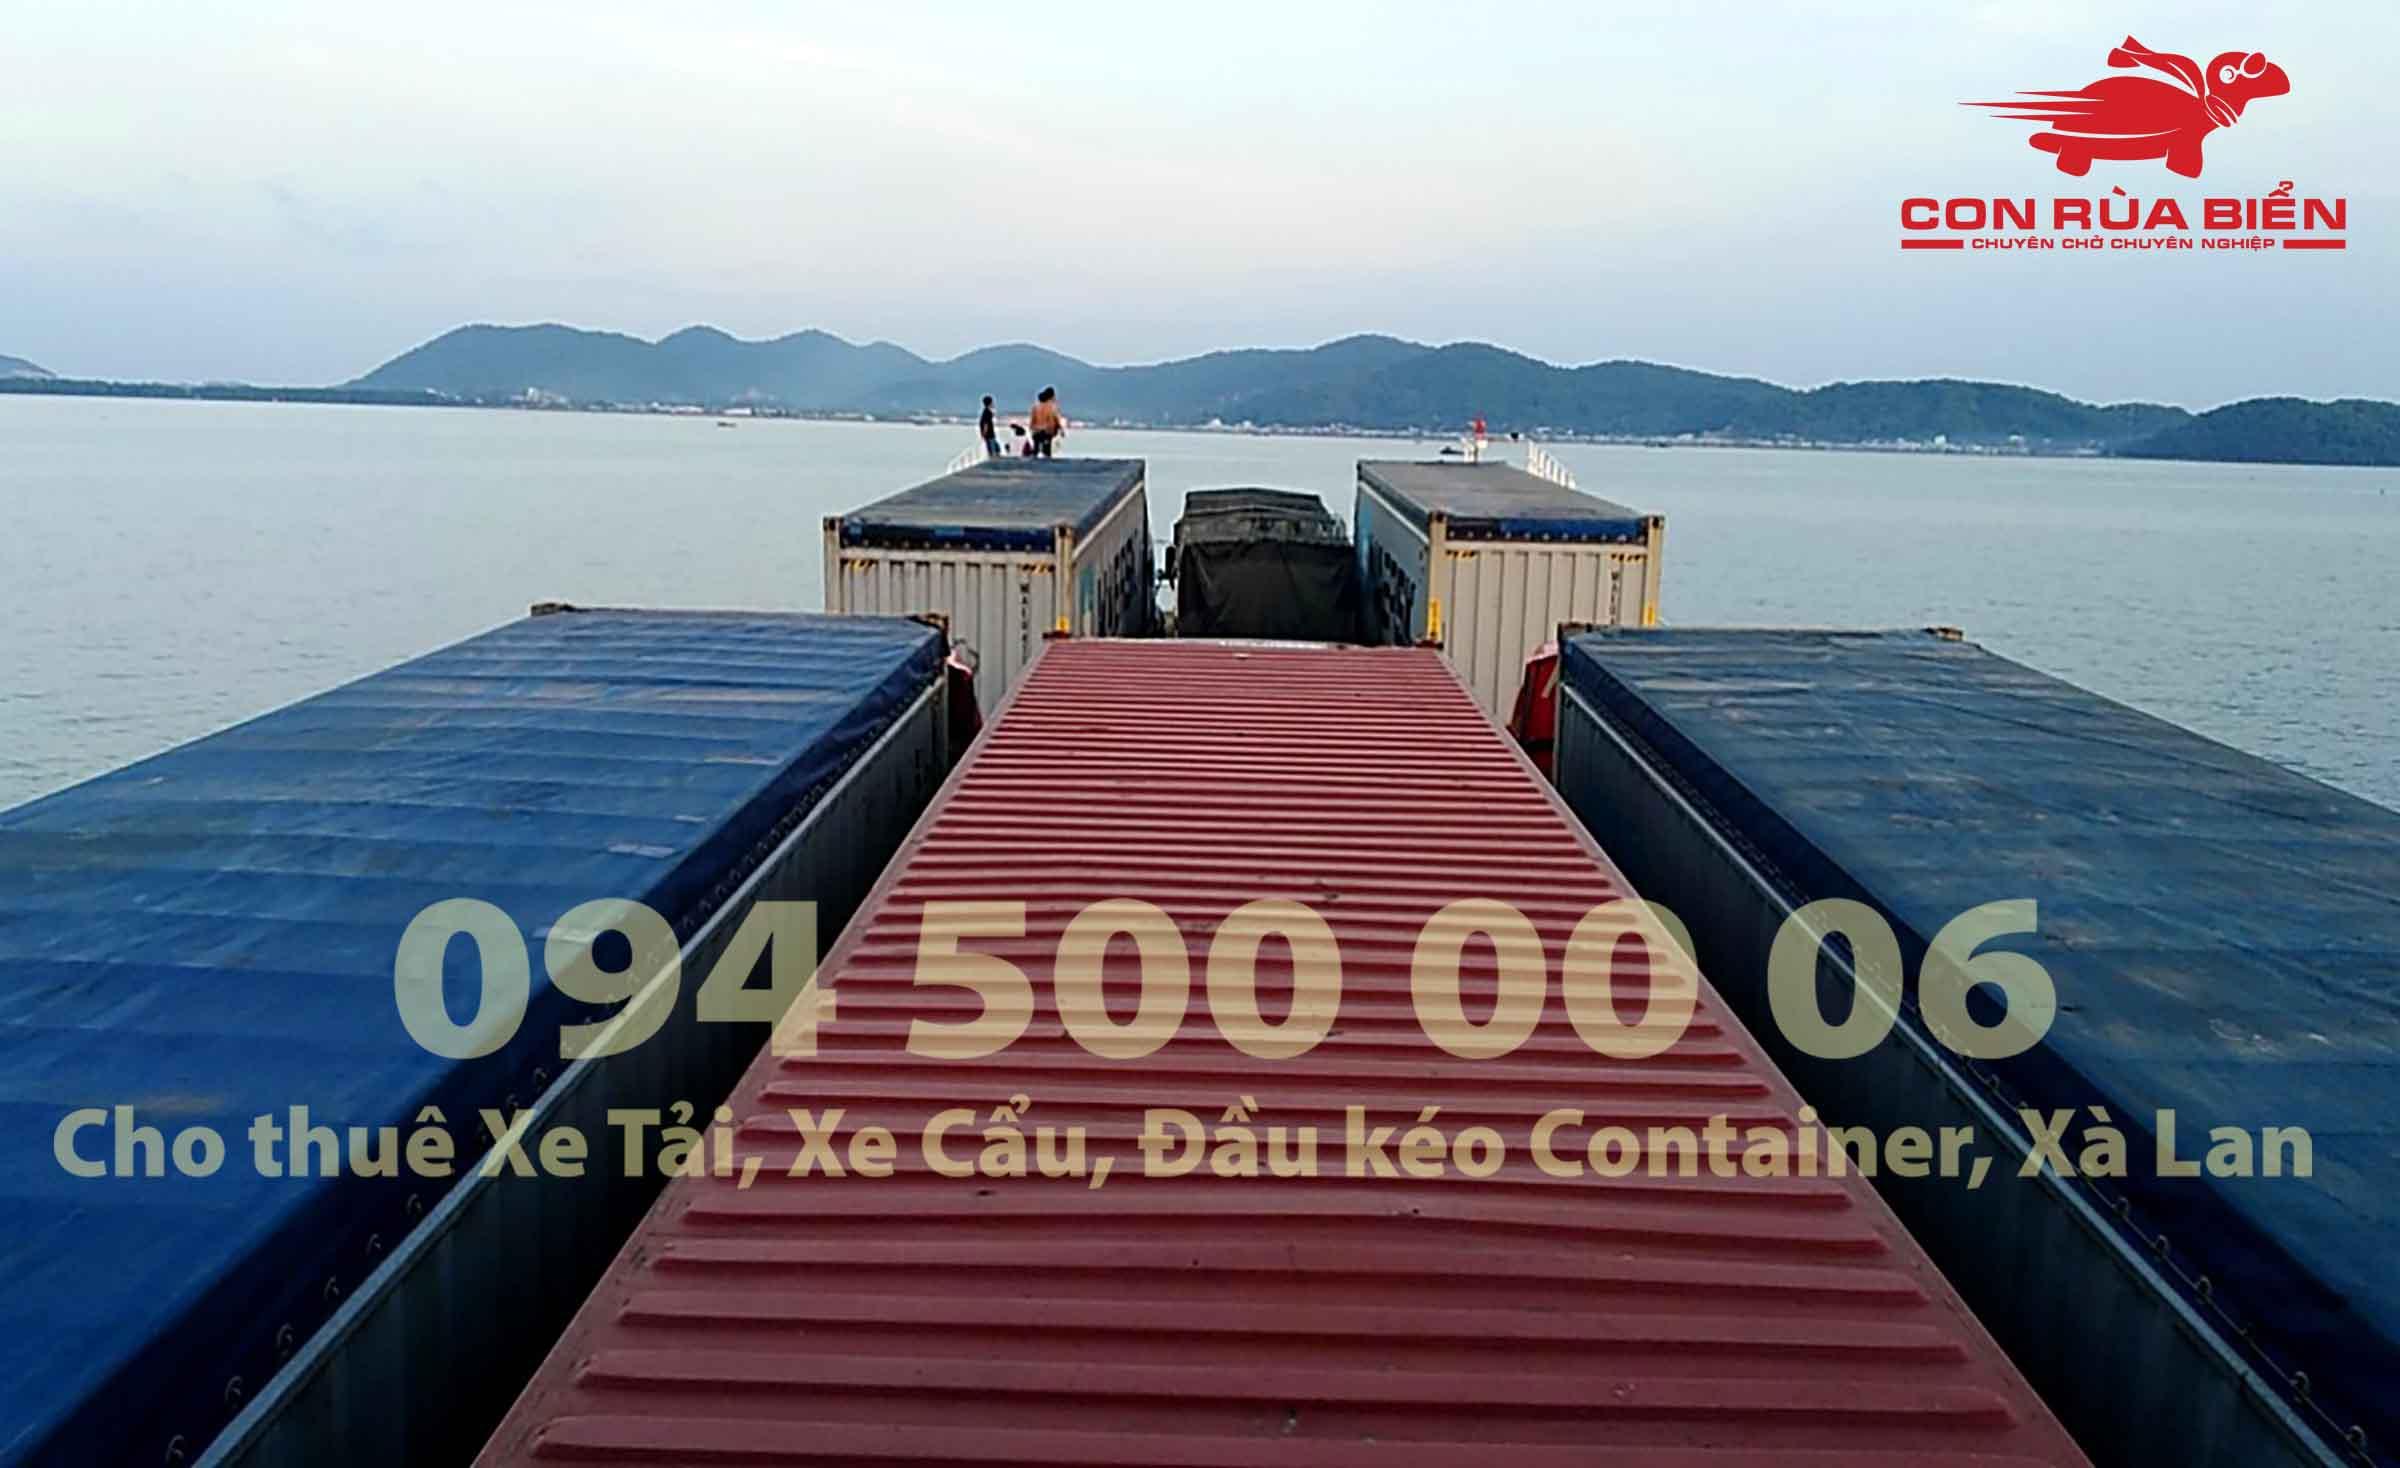 Cho thue xa lan ha mom cho xe tai cho xe dau keo container di Phu Quoc Hon Thom Nam Du 9